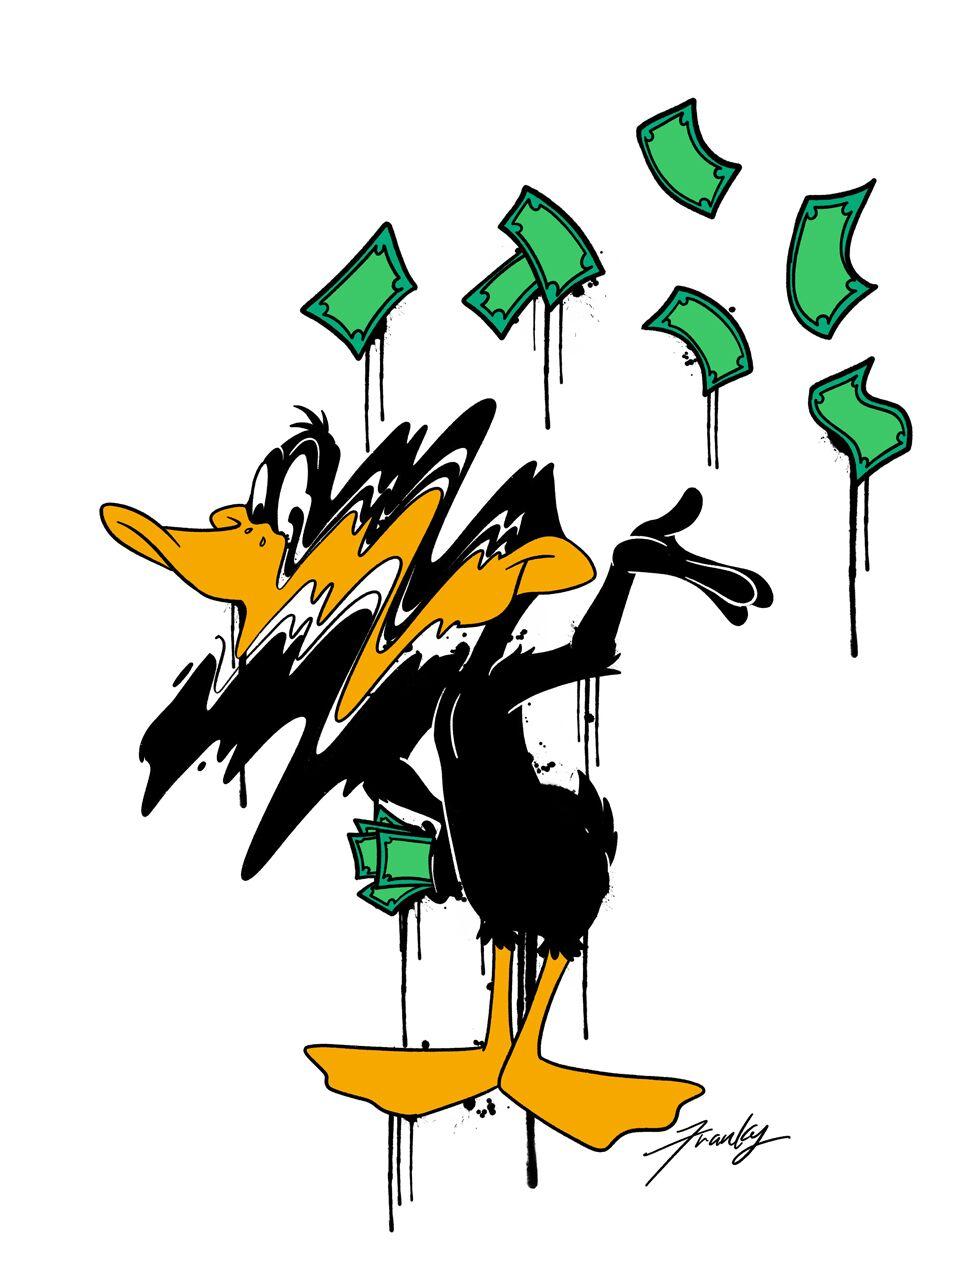 Daffy Rain